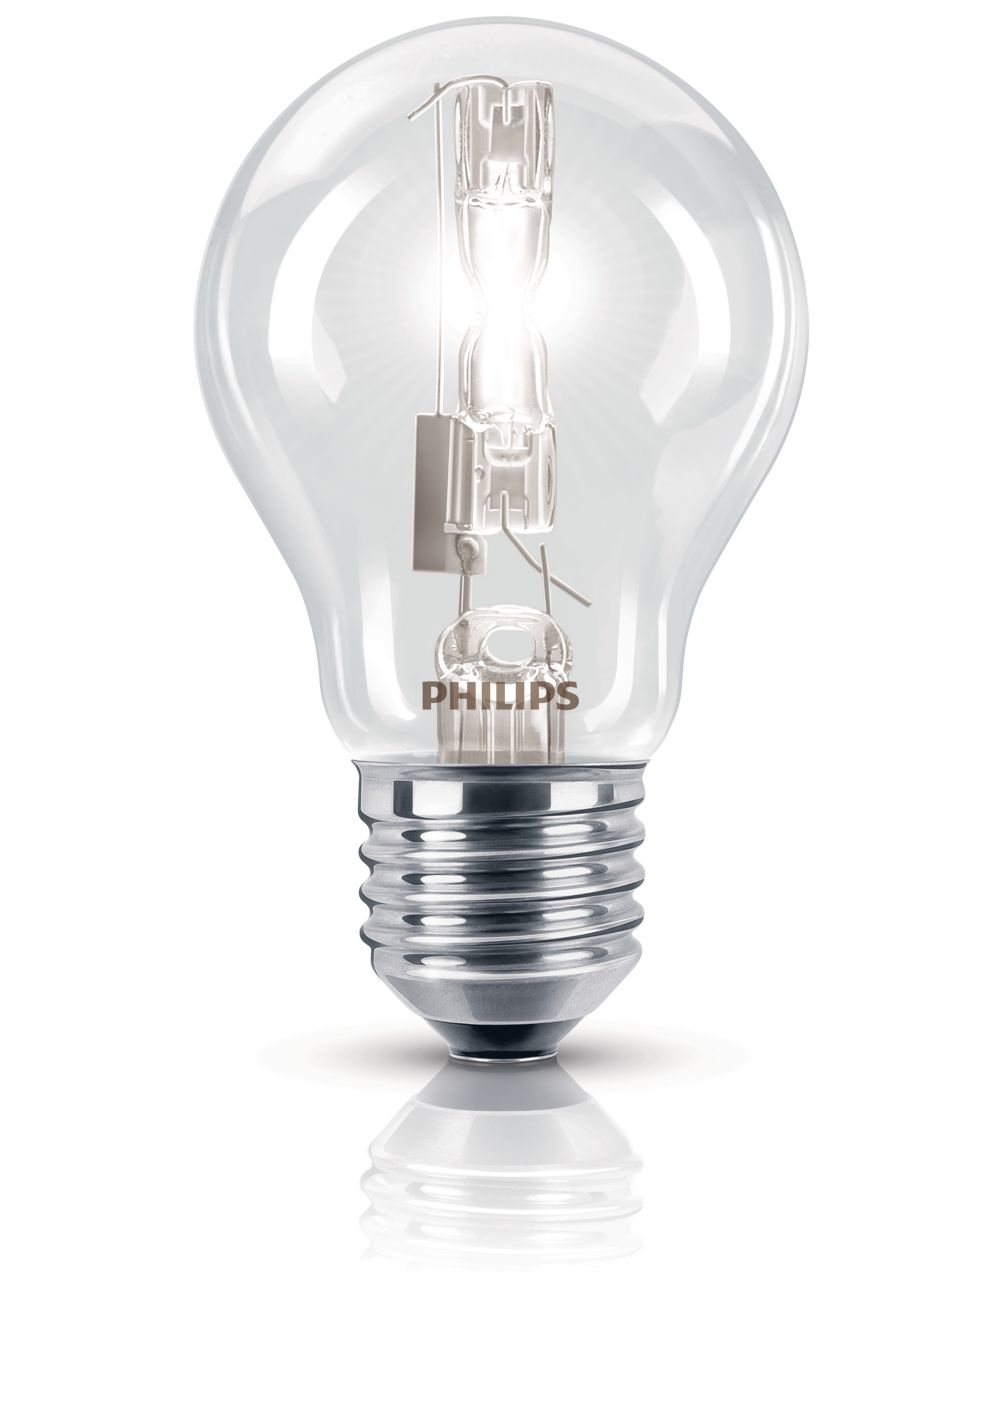 Philips lampadina alogena forma goccia 8727900252002 - Philips illuminazione casa ...